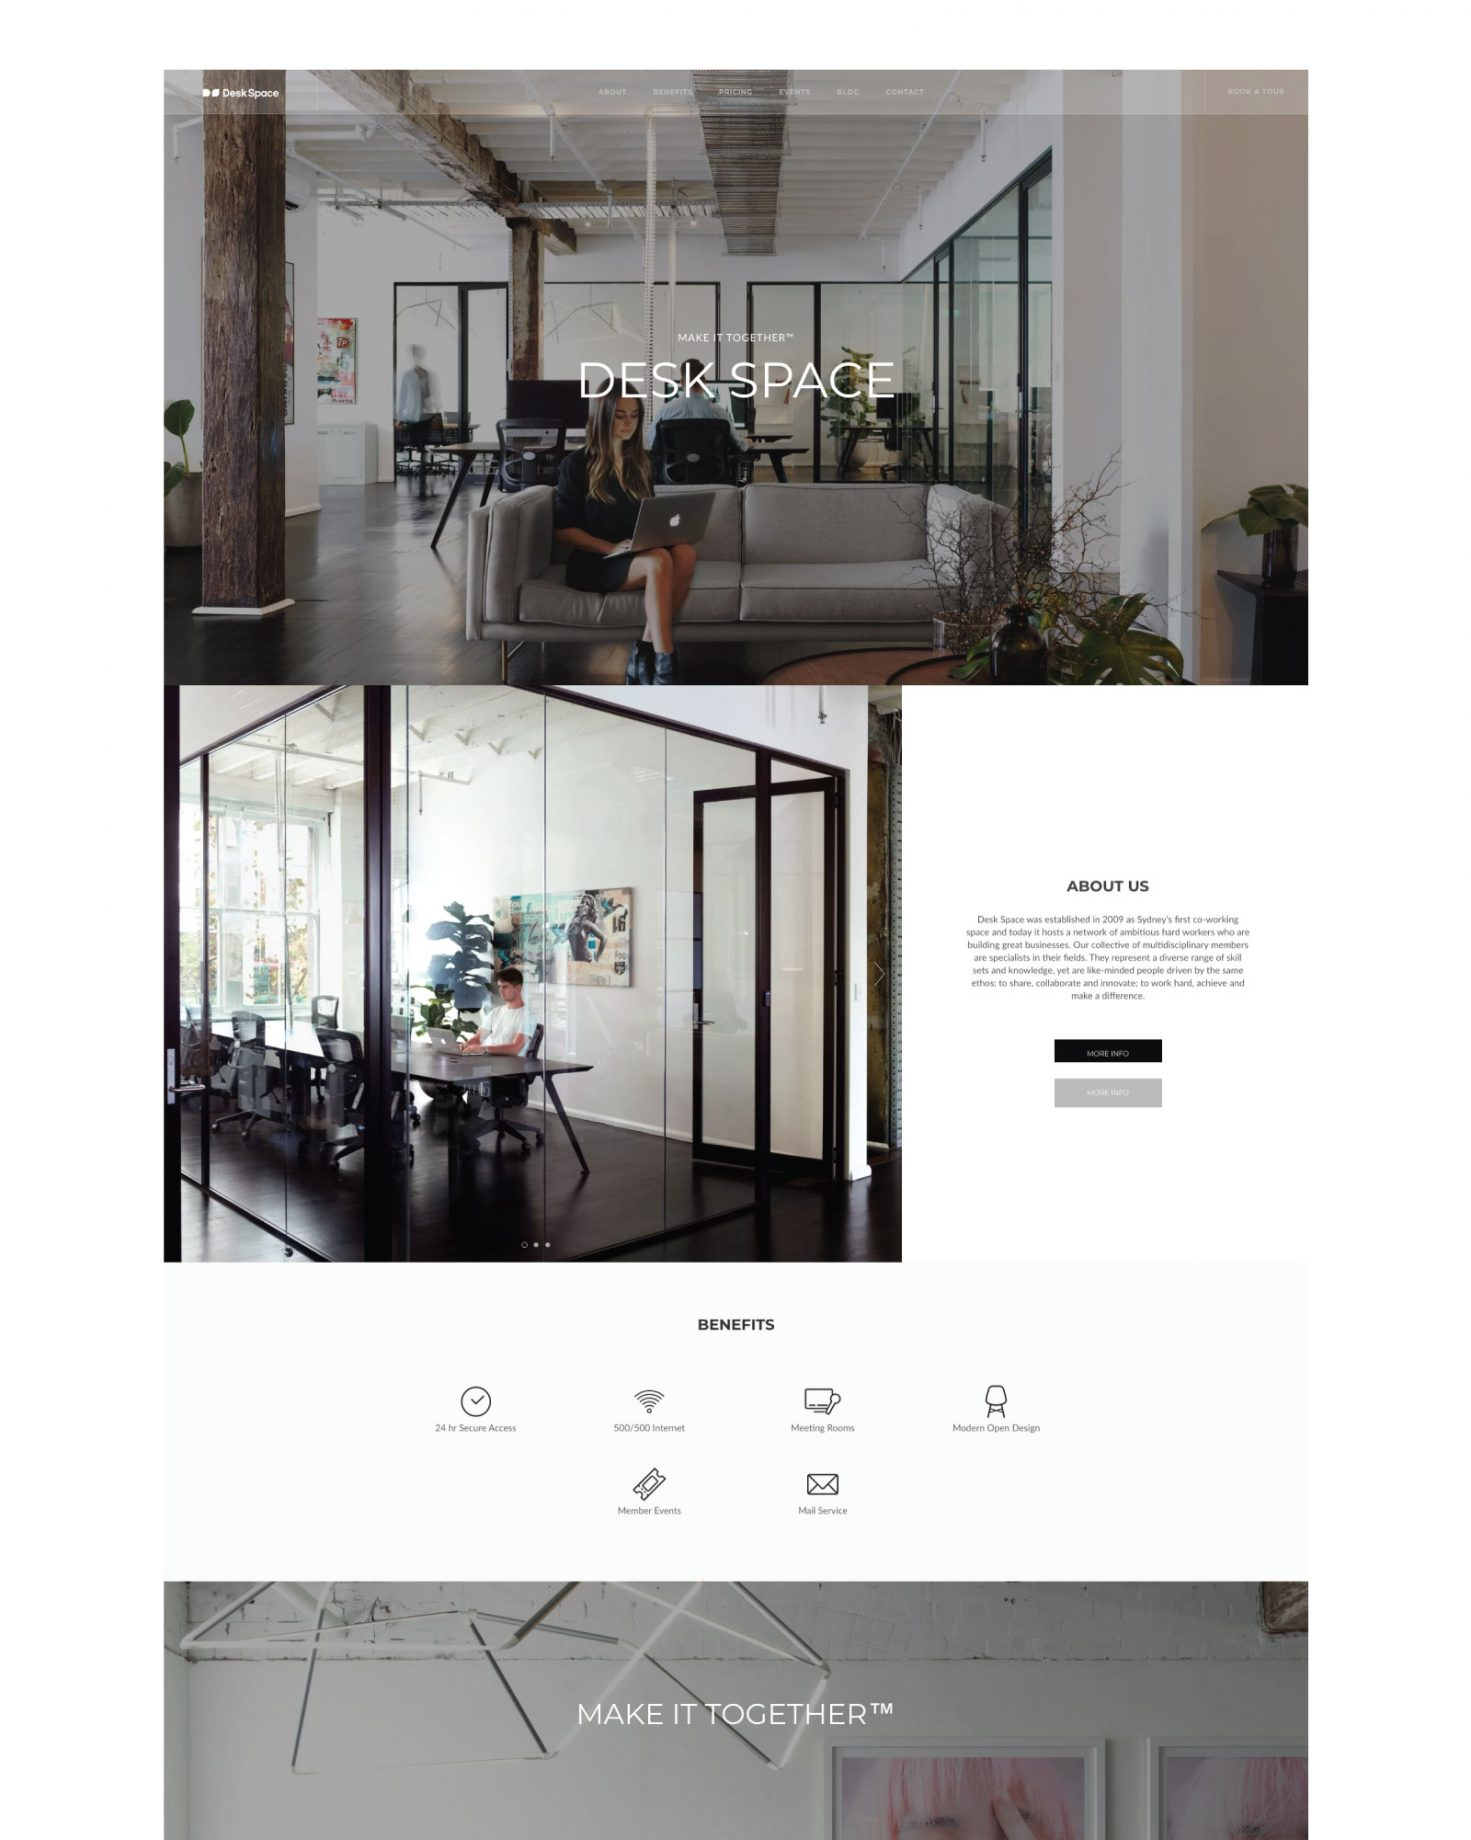 Desk Space Website